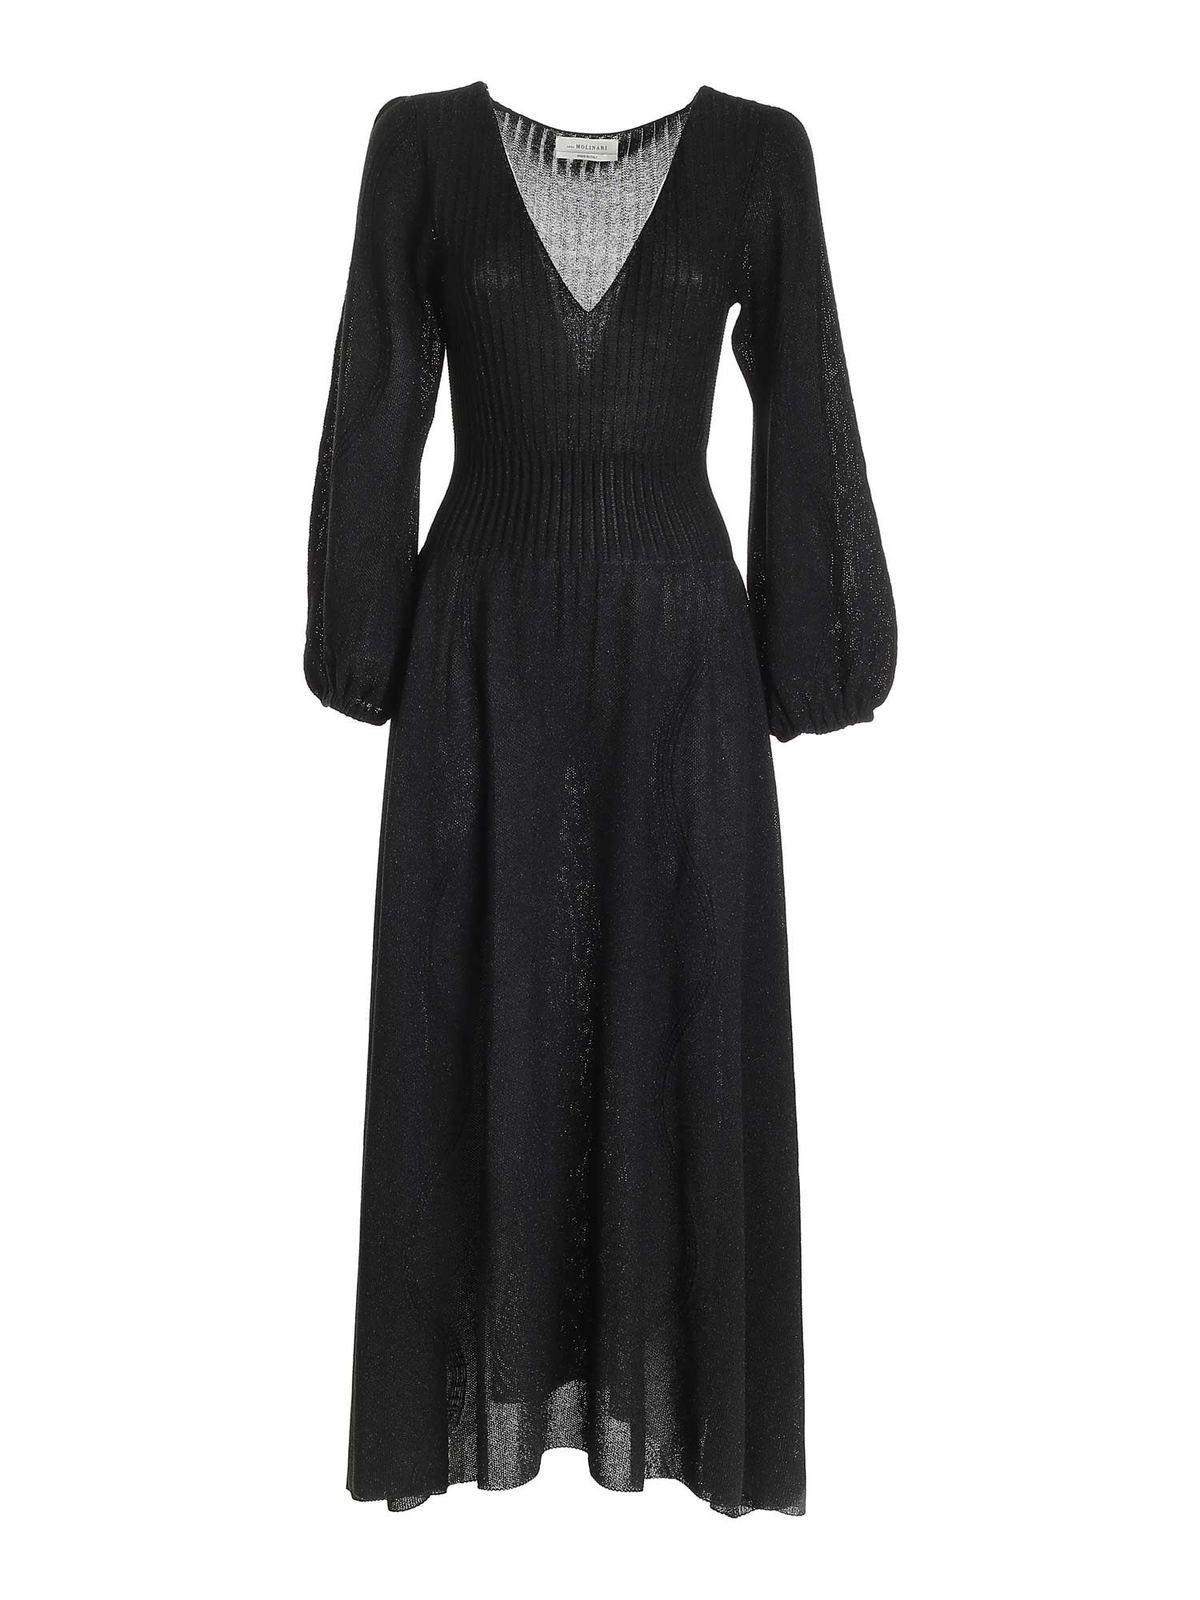 Blumarine LAME LONG DRESS IN BLACK